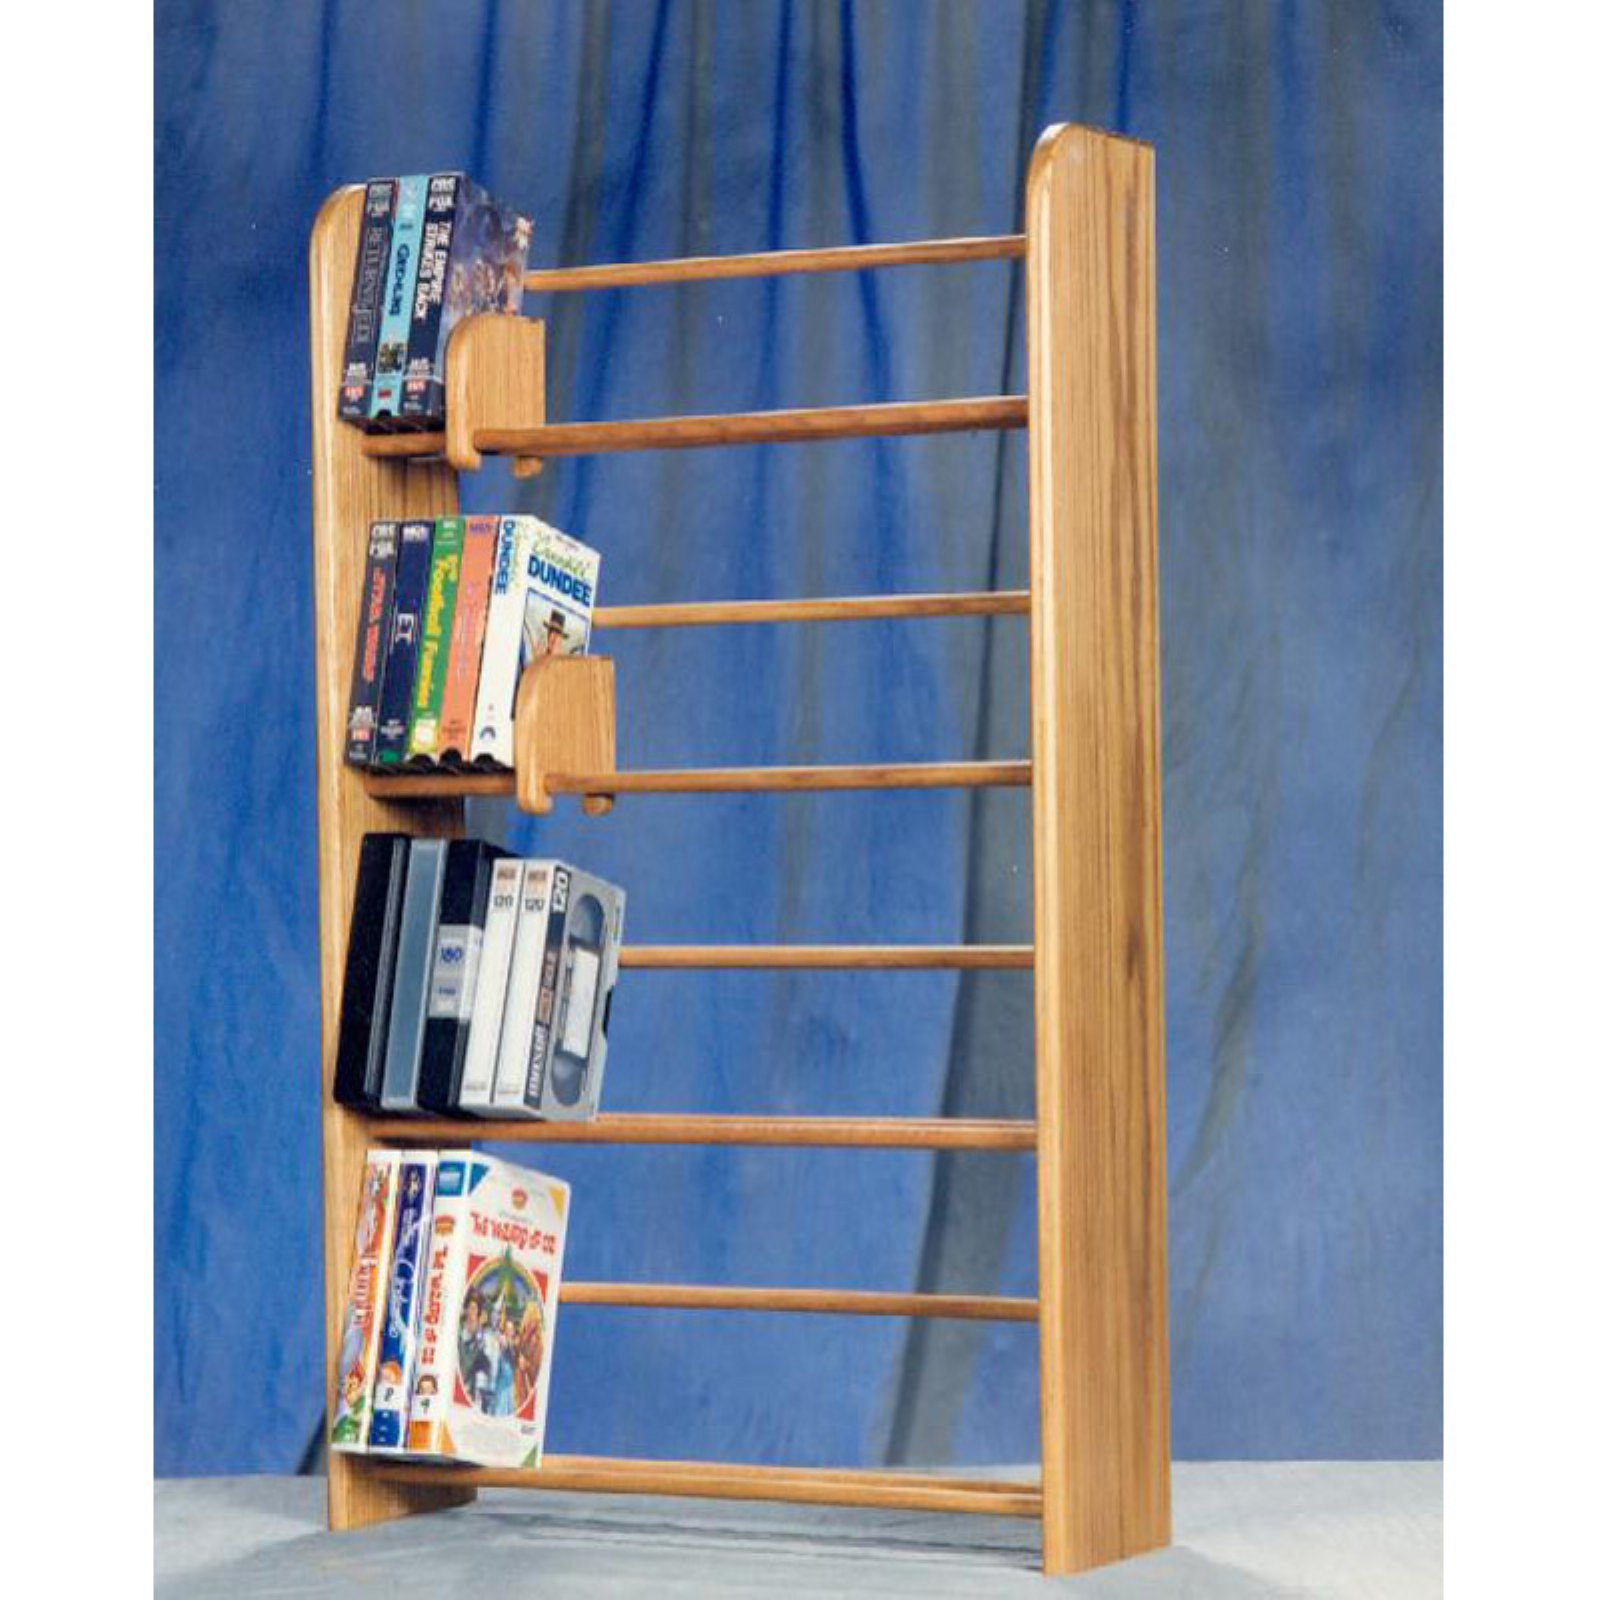 The Wood Shed Solid Oak 4 Row Dowel DVD / VHS Media Rack